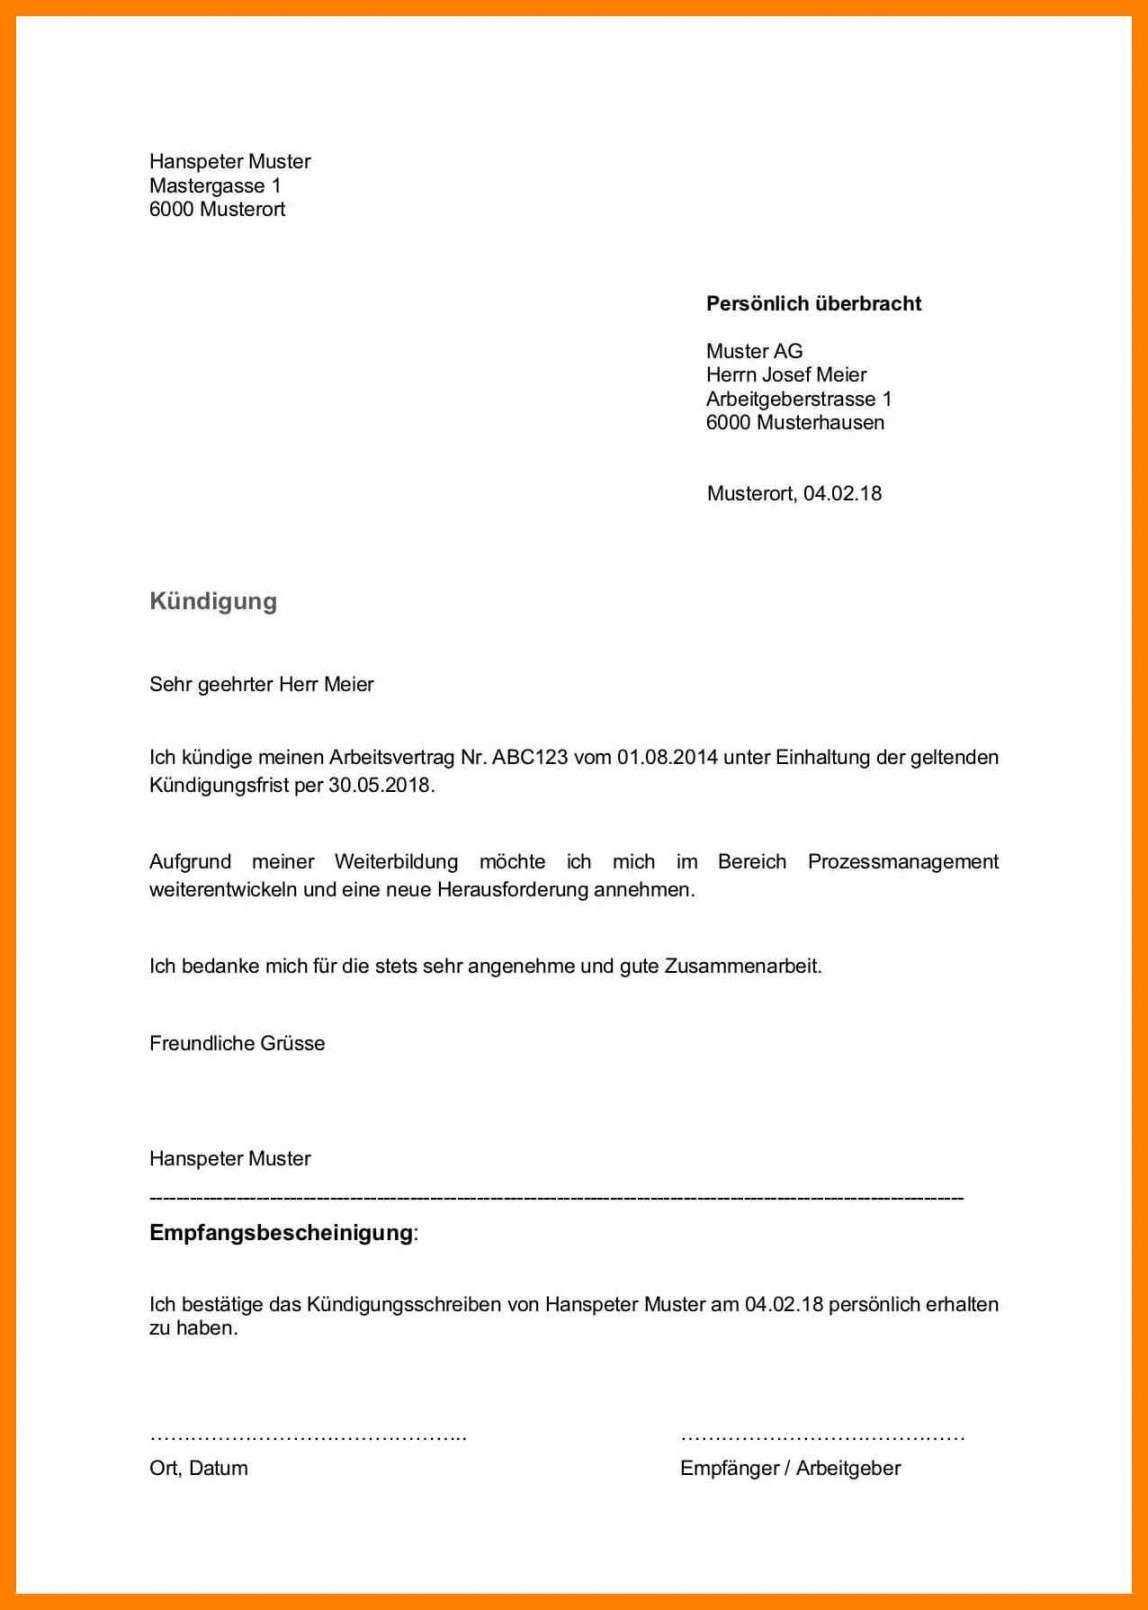 Arbeitsvertrag Aushilfe Vorlage Handyvertrag Aushilfe Vorlagen